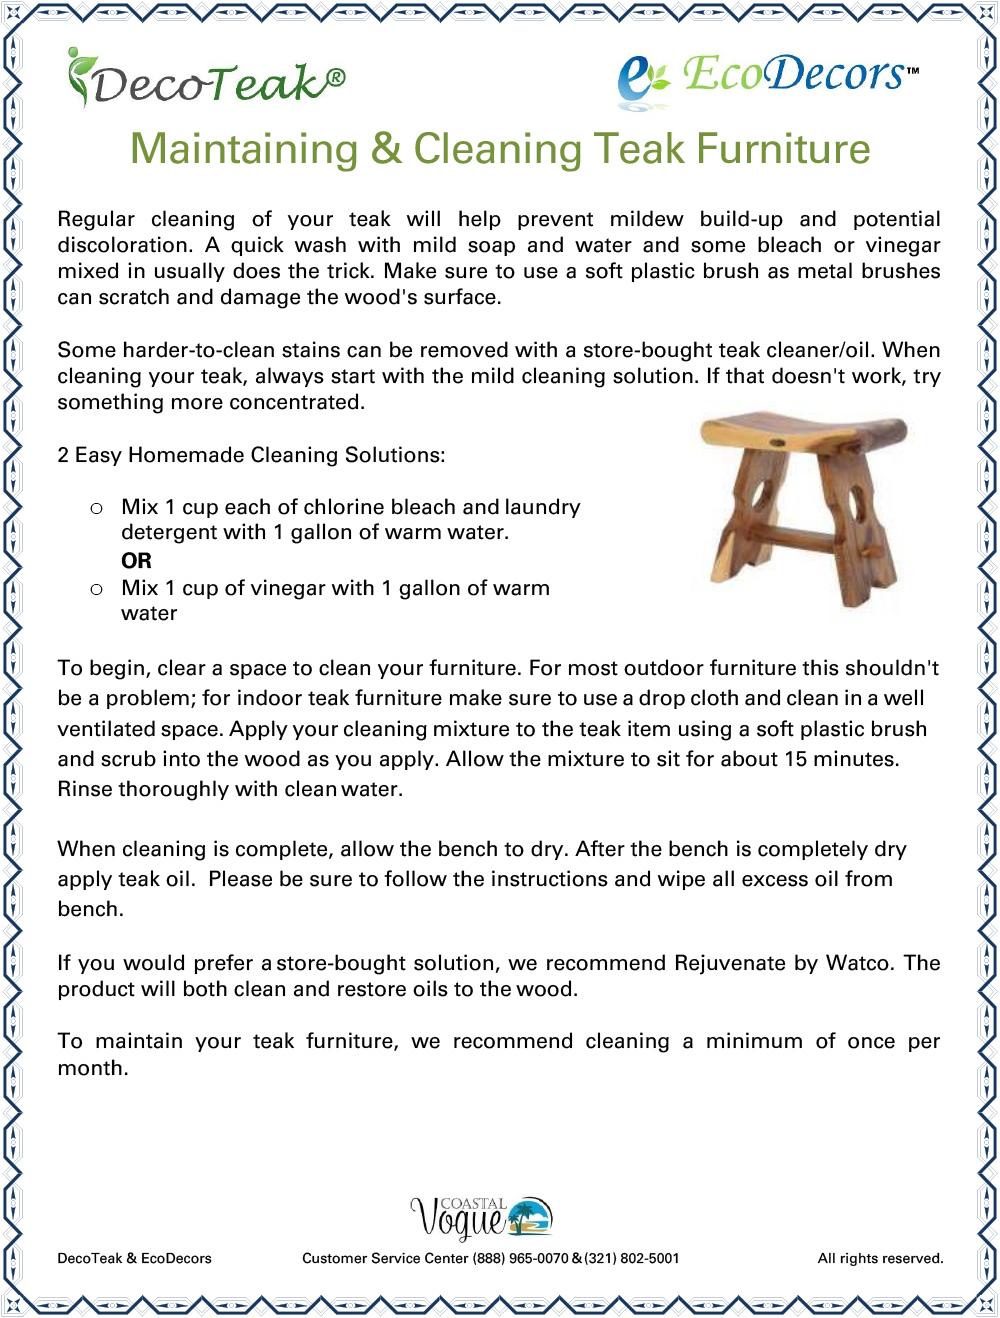 cleaning-teak-furniture-full.jpg